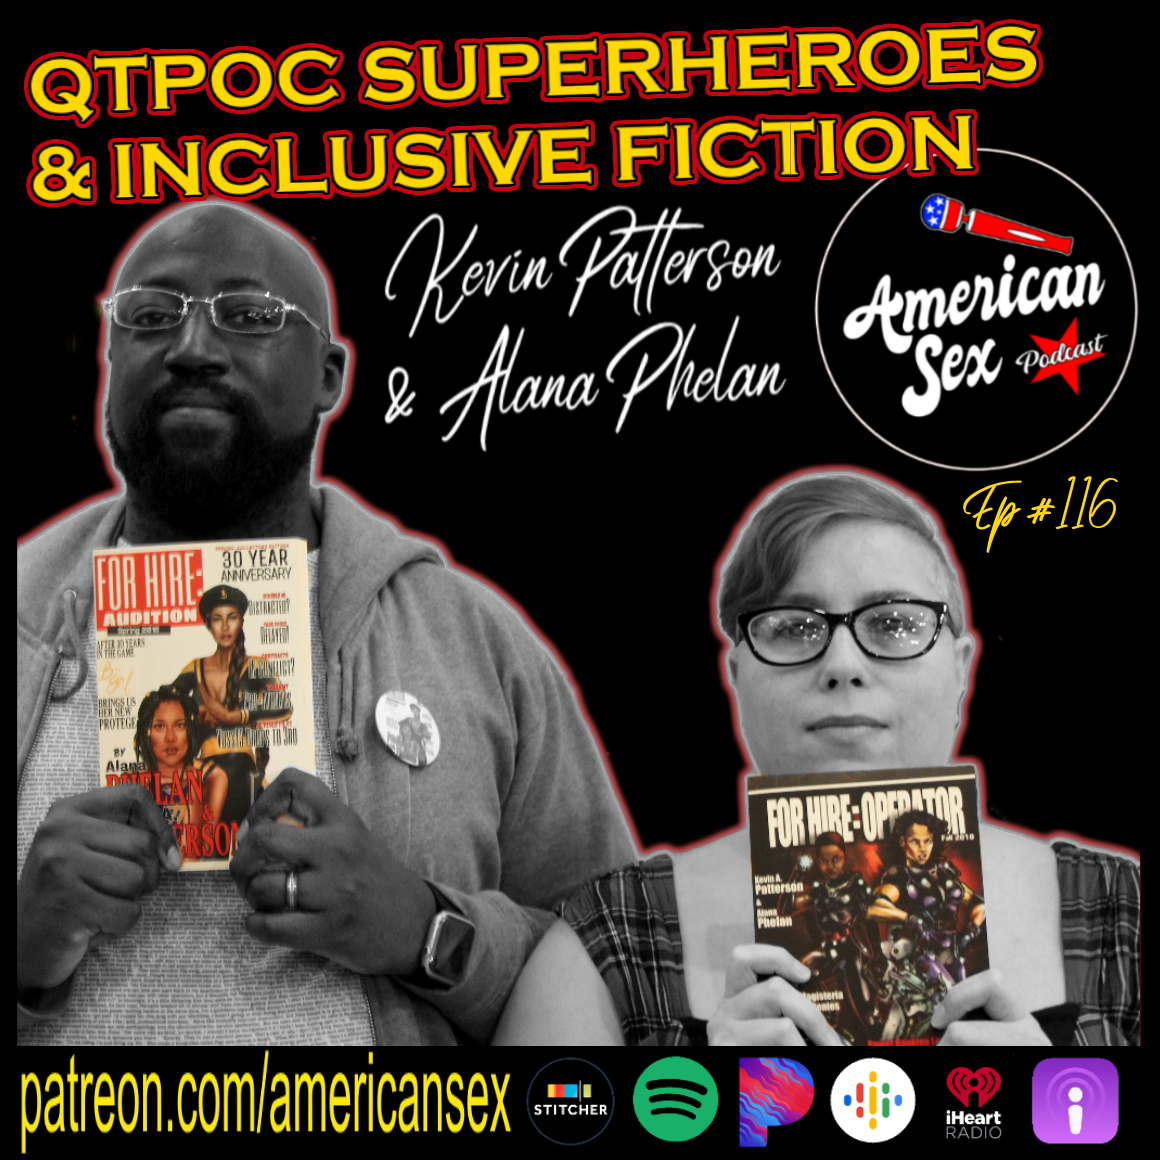 QTPOC Superheroes For Hire Series